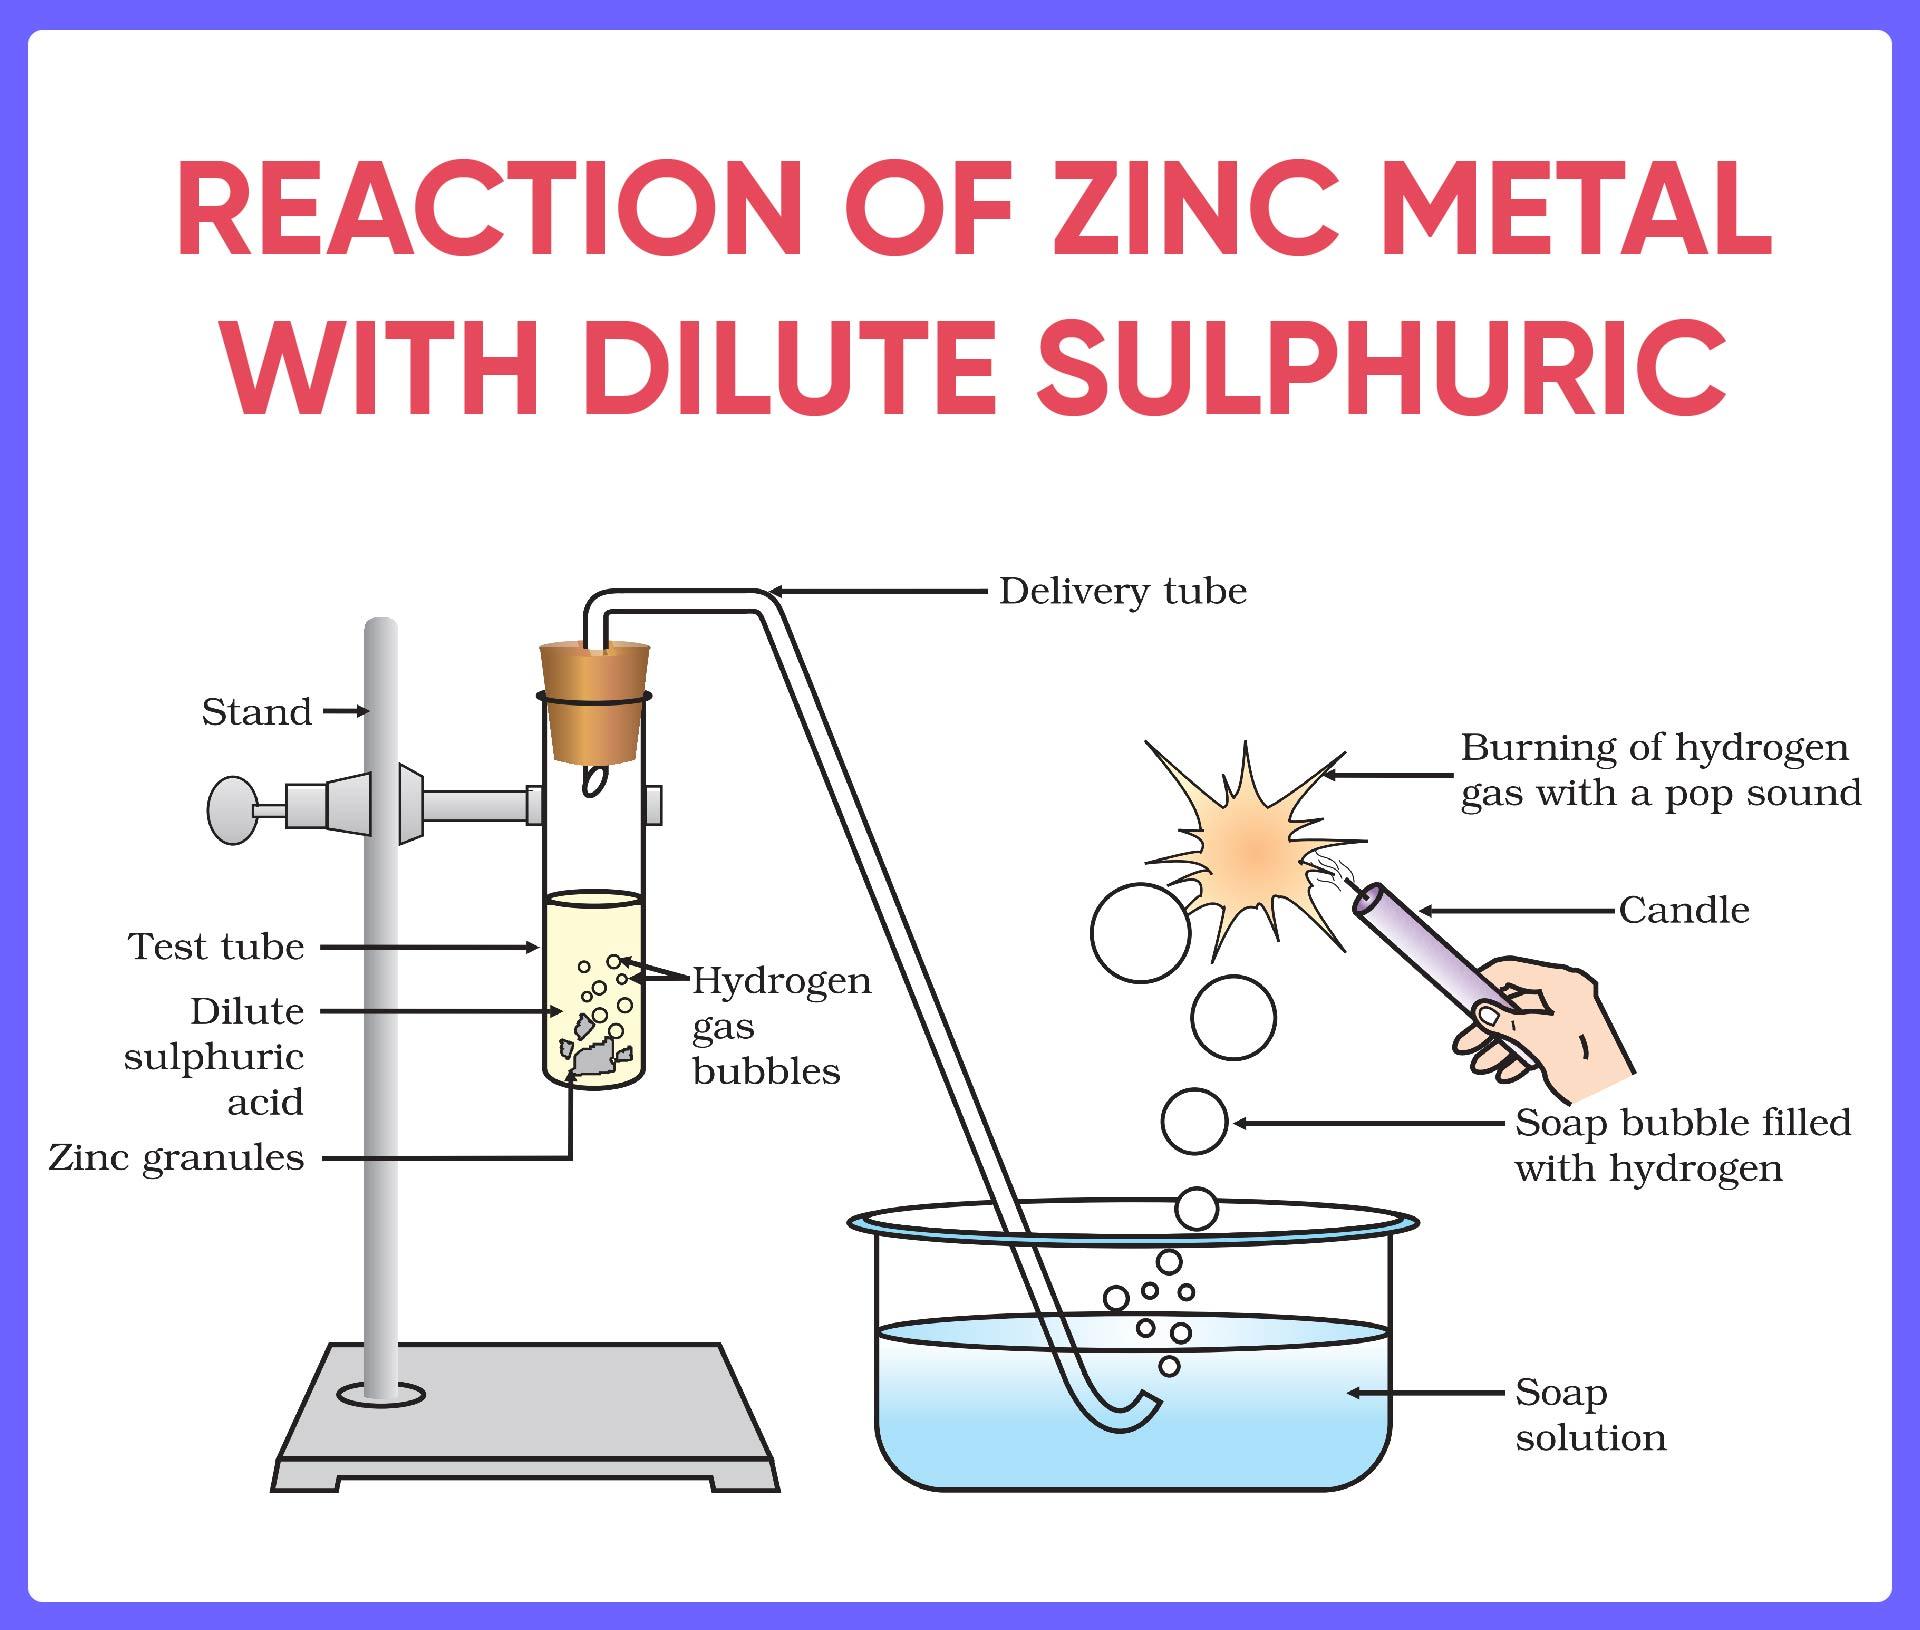 Reaction of Zinc Metal with Dilute Sulphuric Acid.jpg